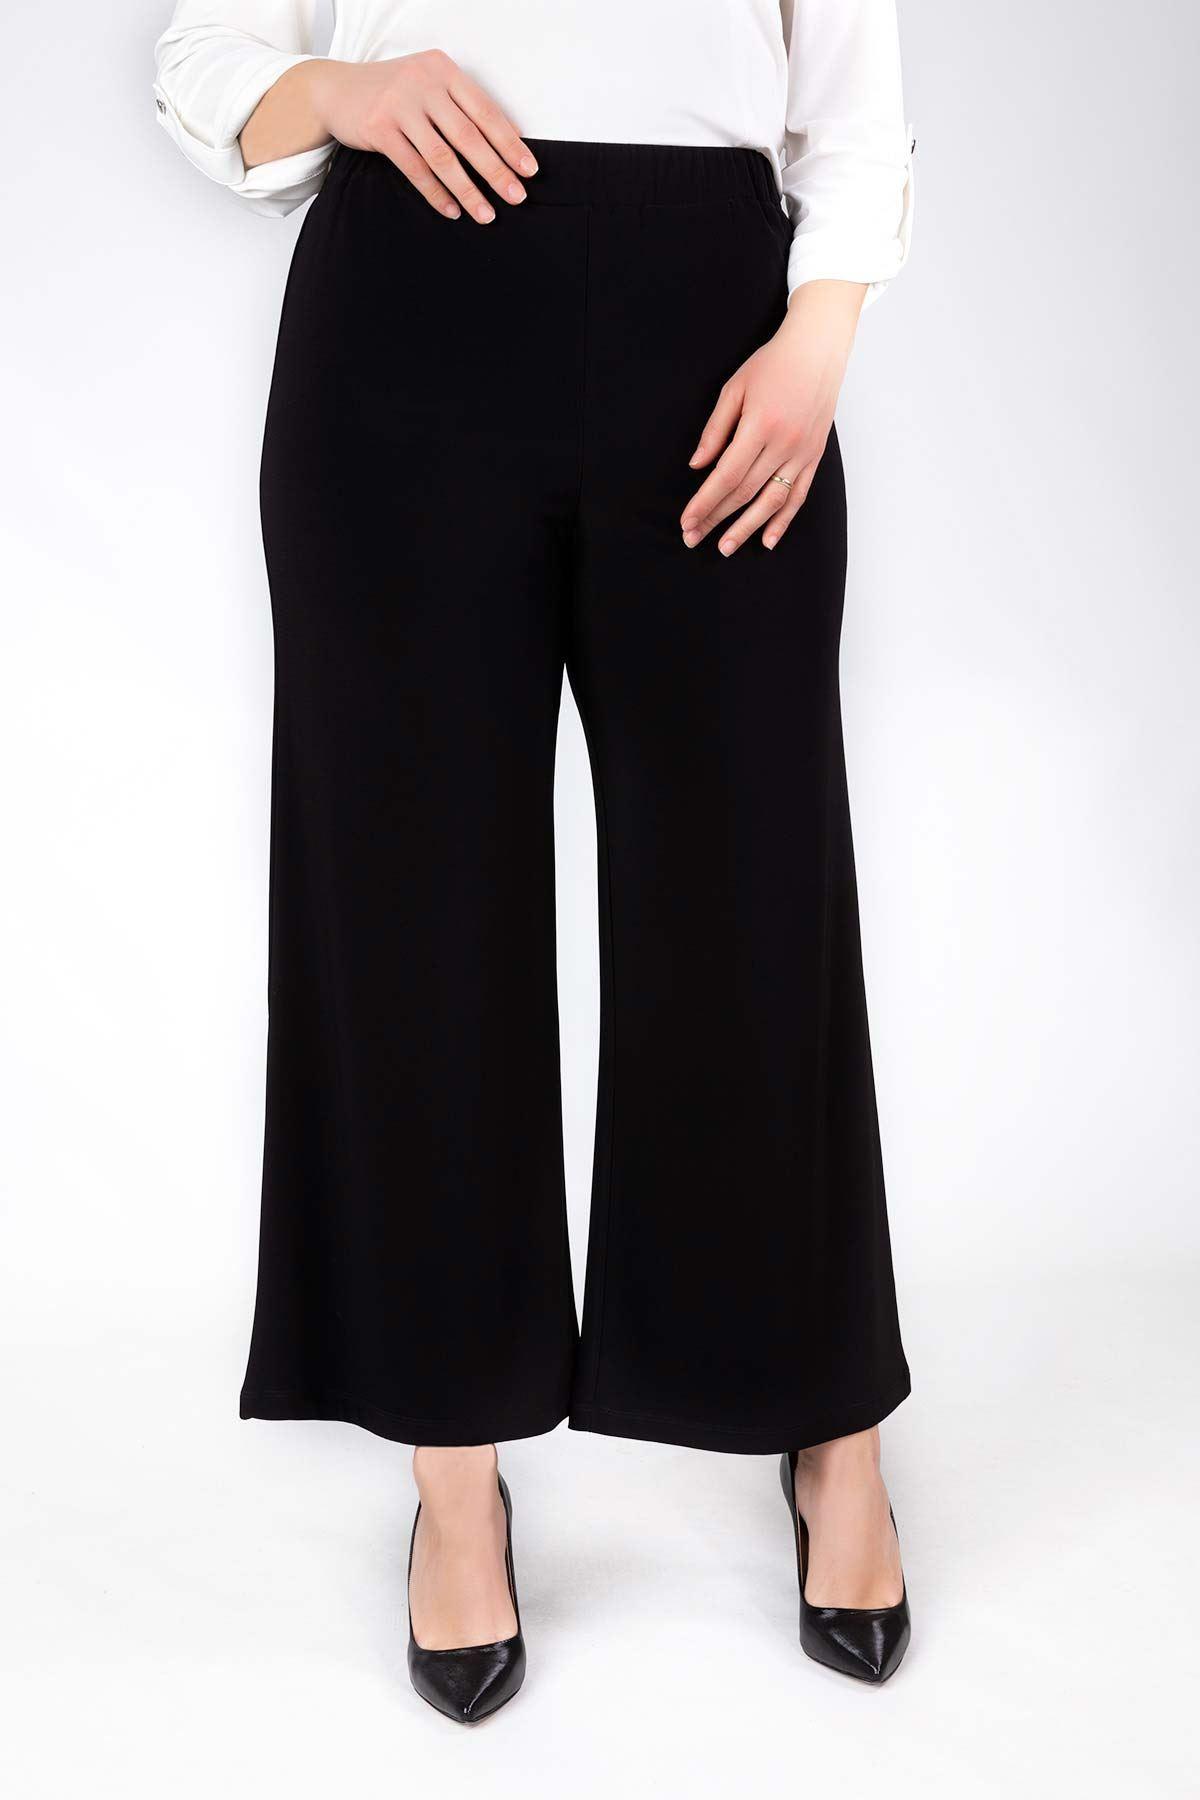 Bol Paça Sandy Pantolon Siyah 10004